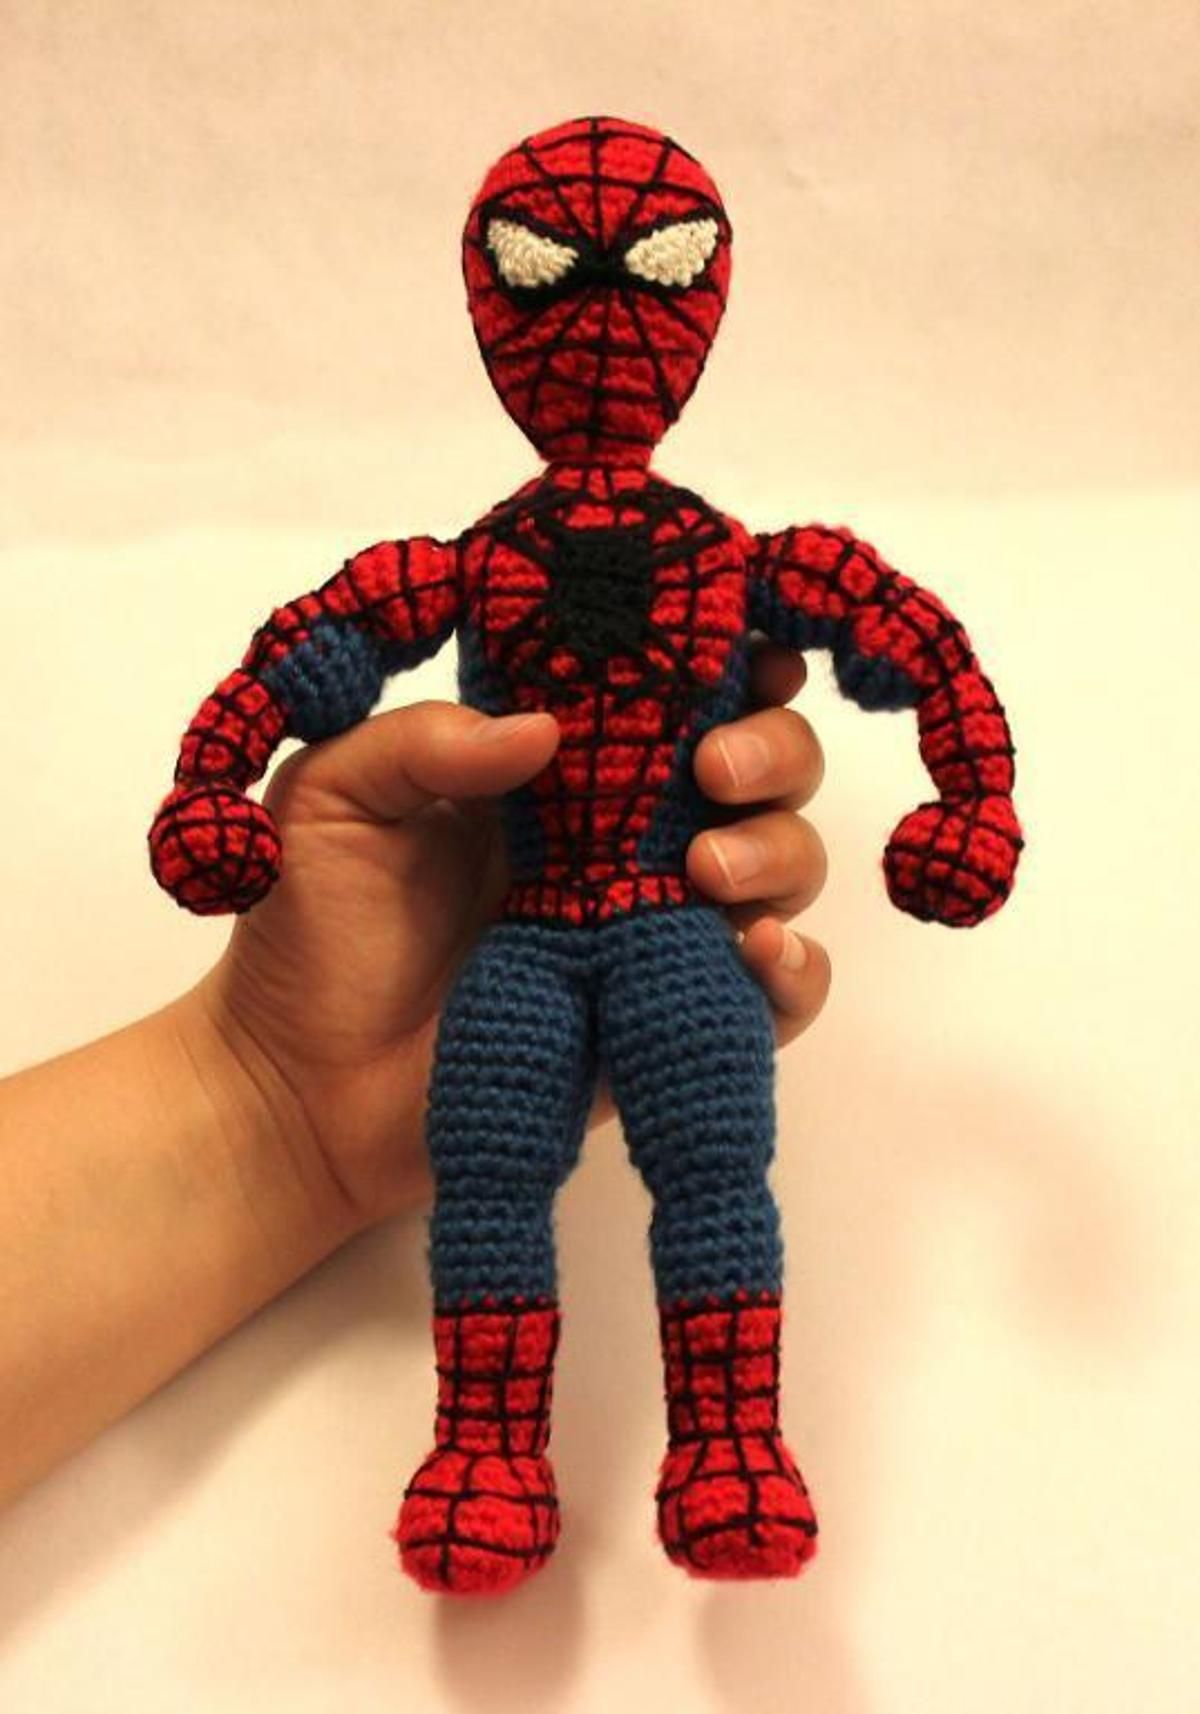 Spiderman Superhero Amigurumi Crochet | Amigurumi | Pinterest